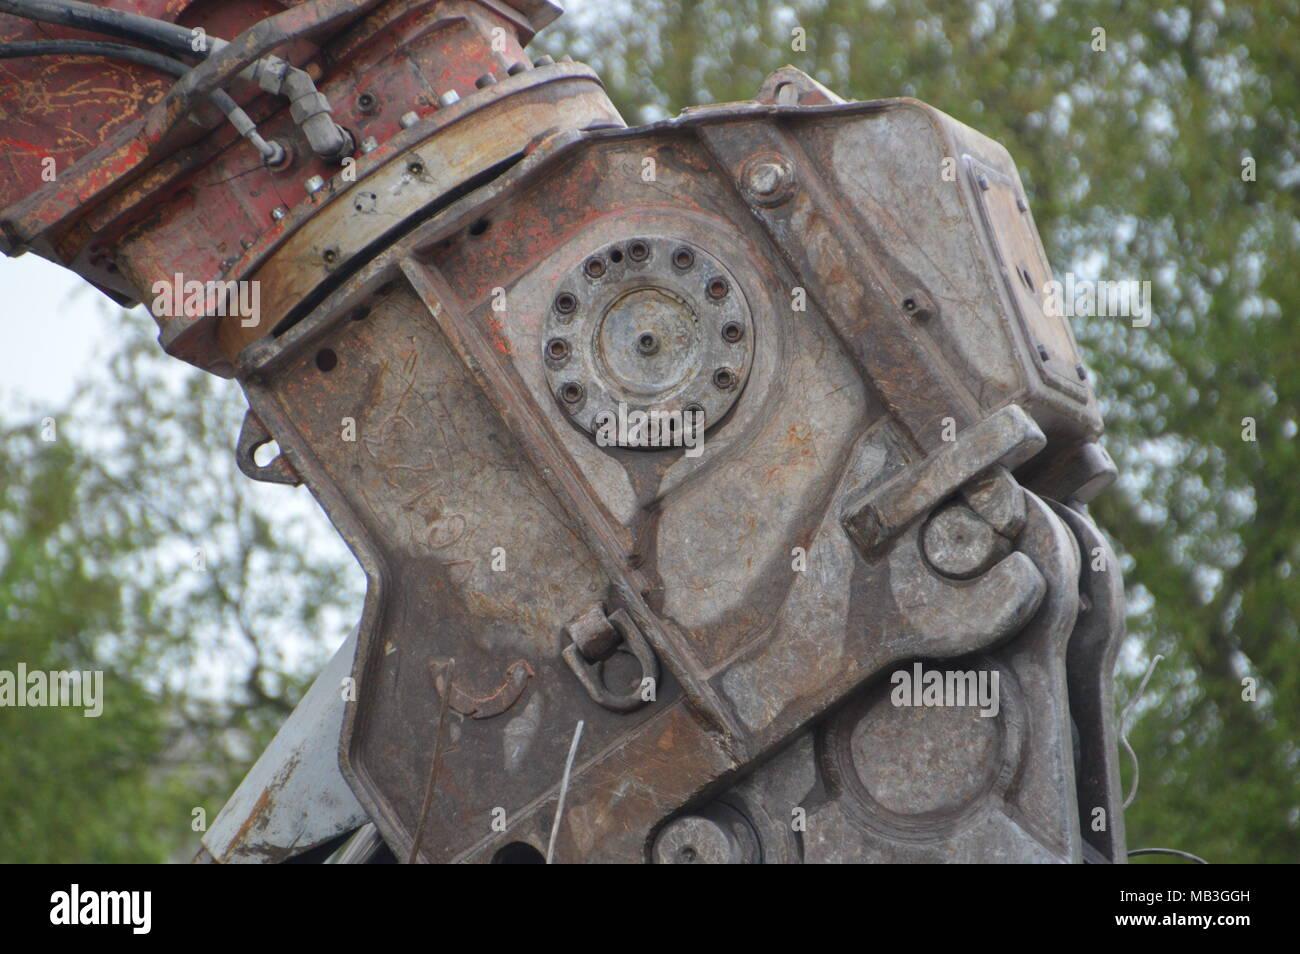 Close Up Of A Grab Crane - Stock Image